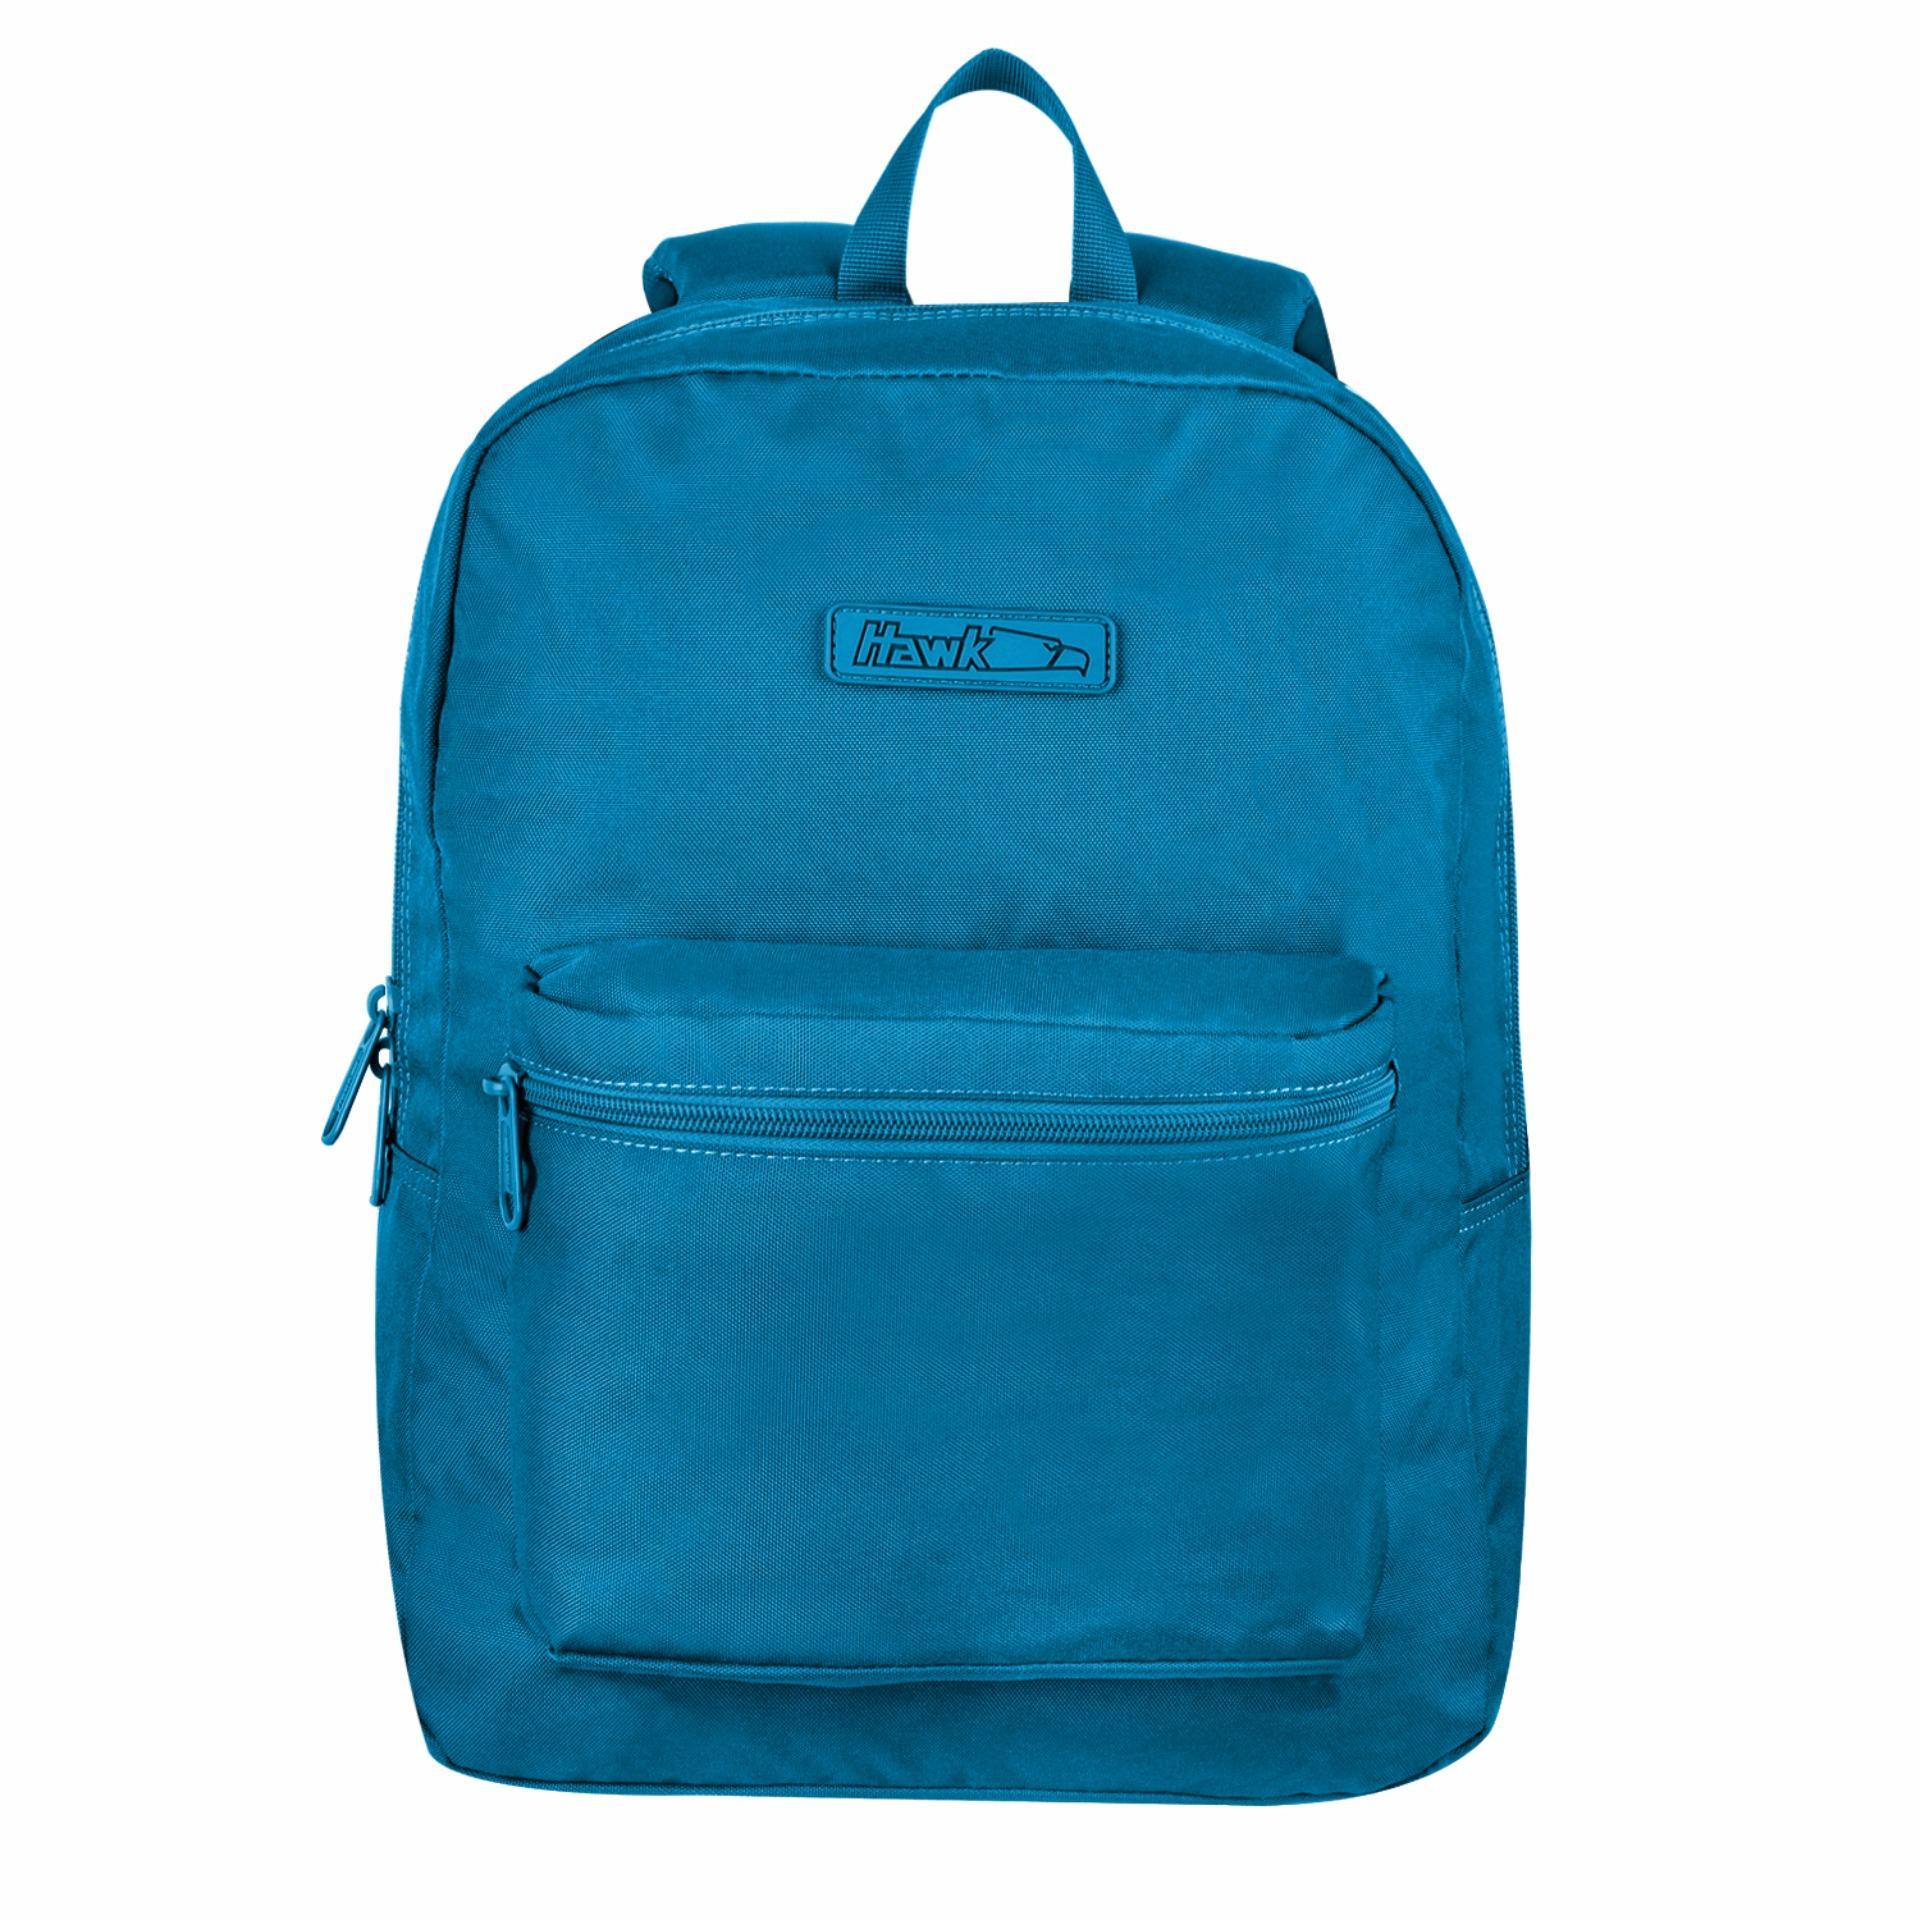 8e8b93d45016 Nike Laptop Backpack Philippines- Fenix Toulouse Handball